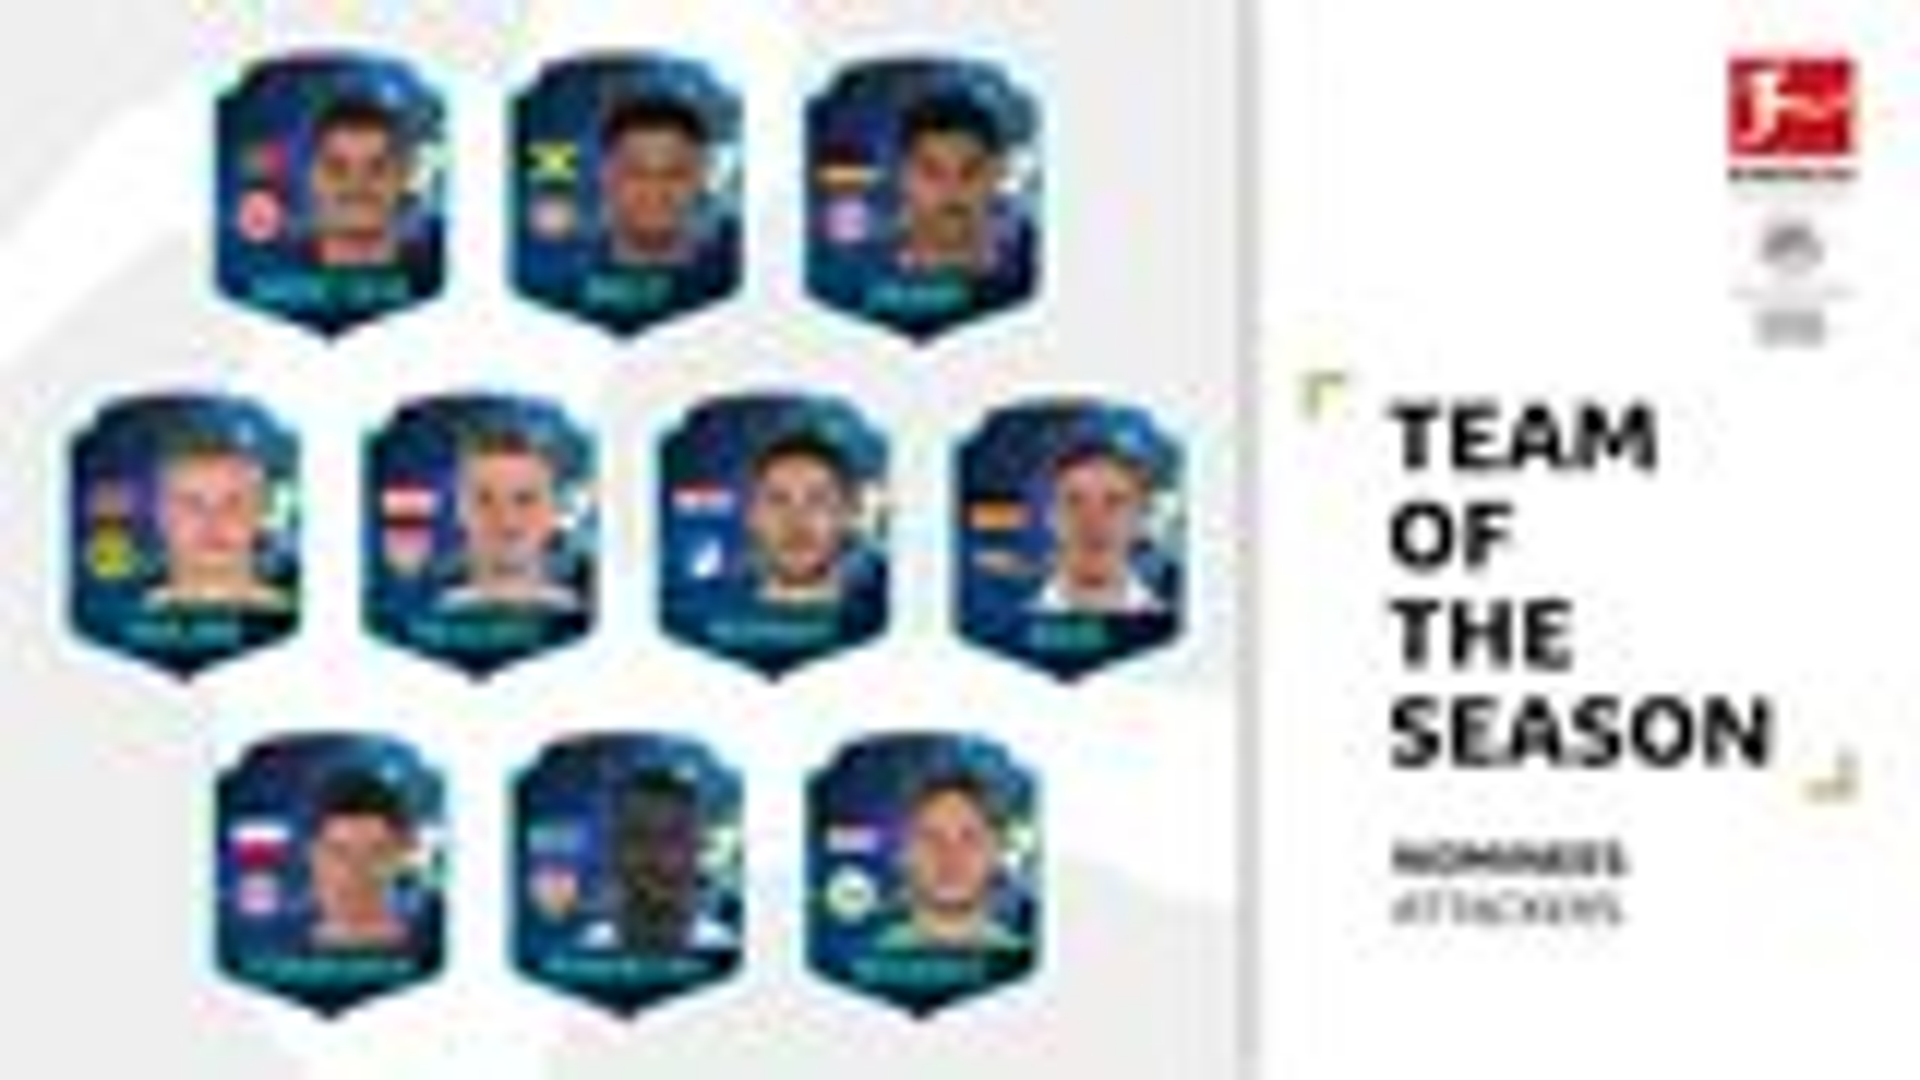 Bundesliga Team of the Season: Attackers